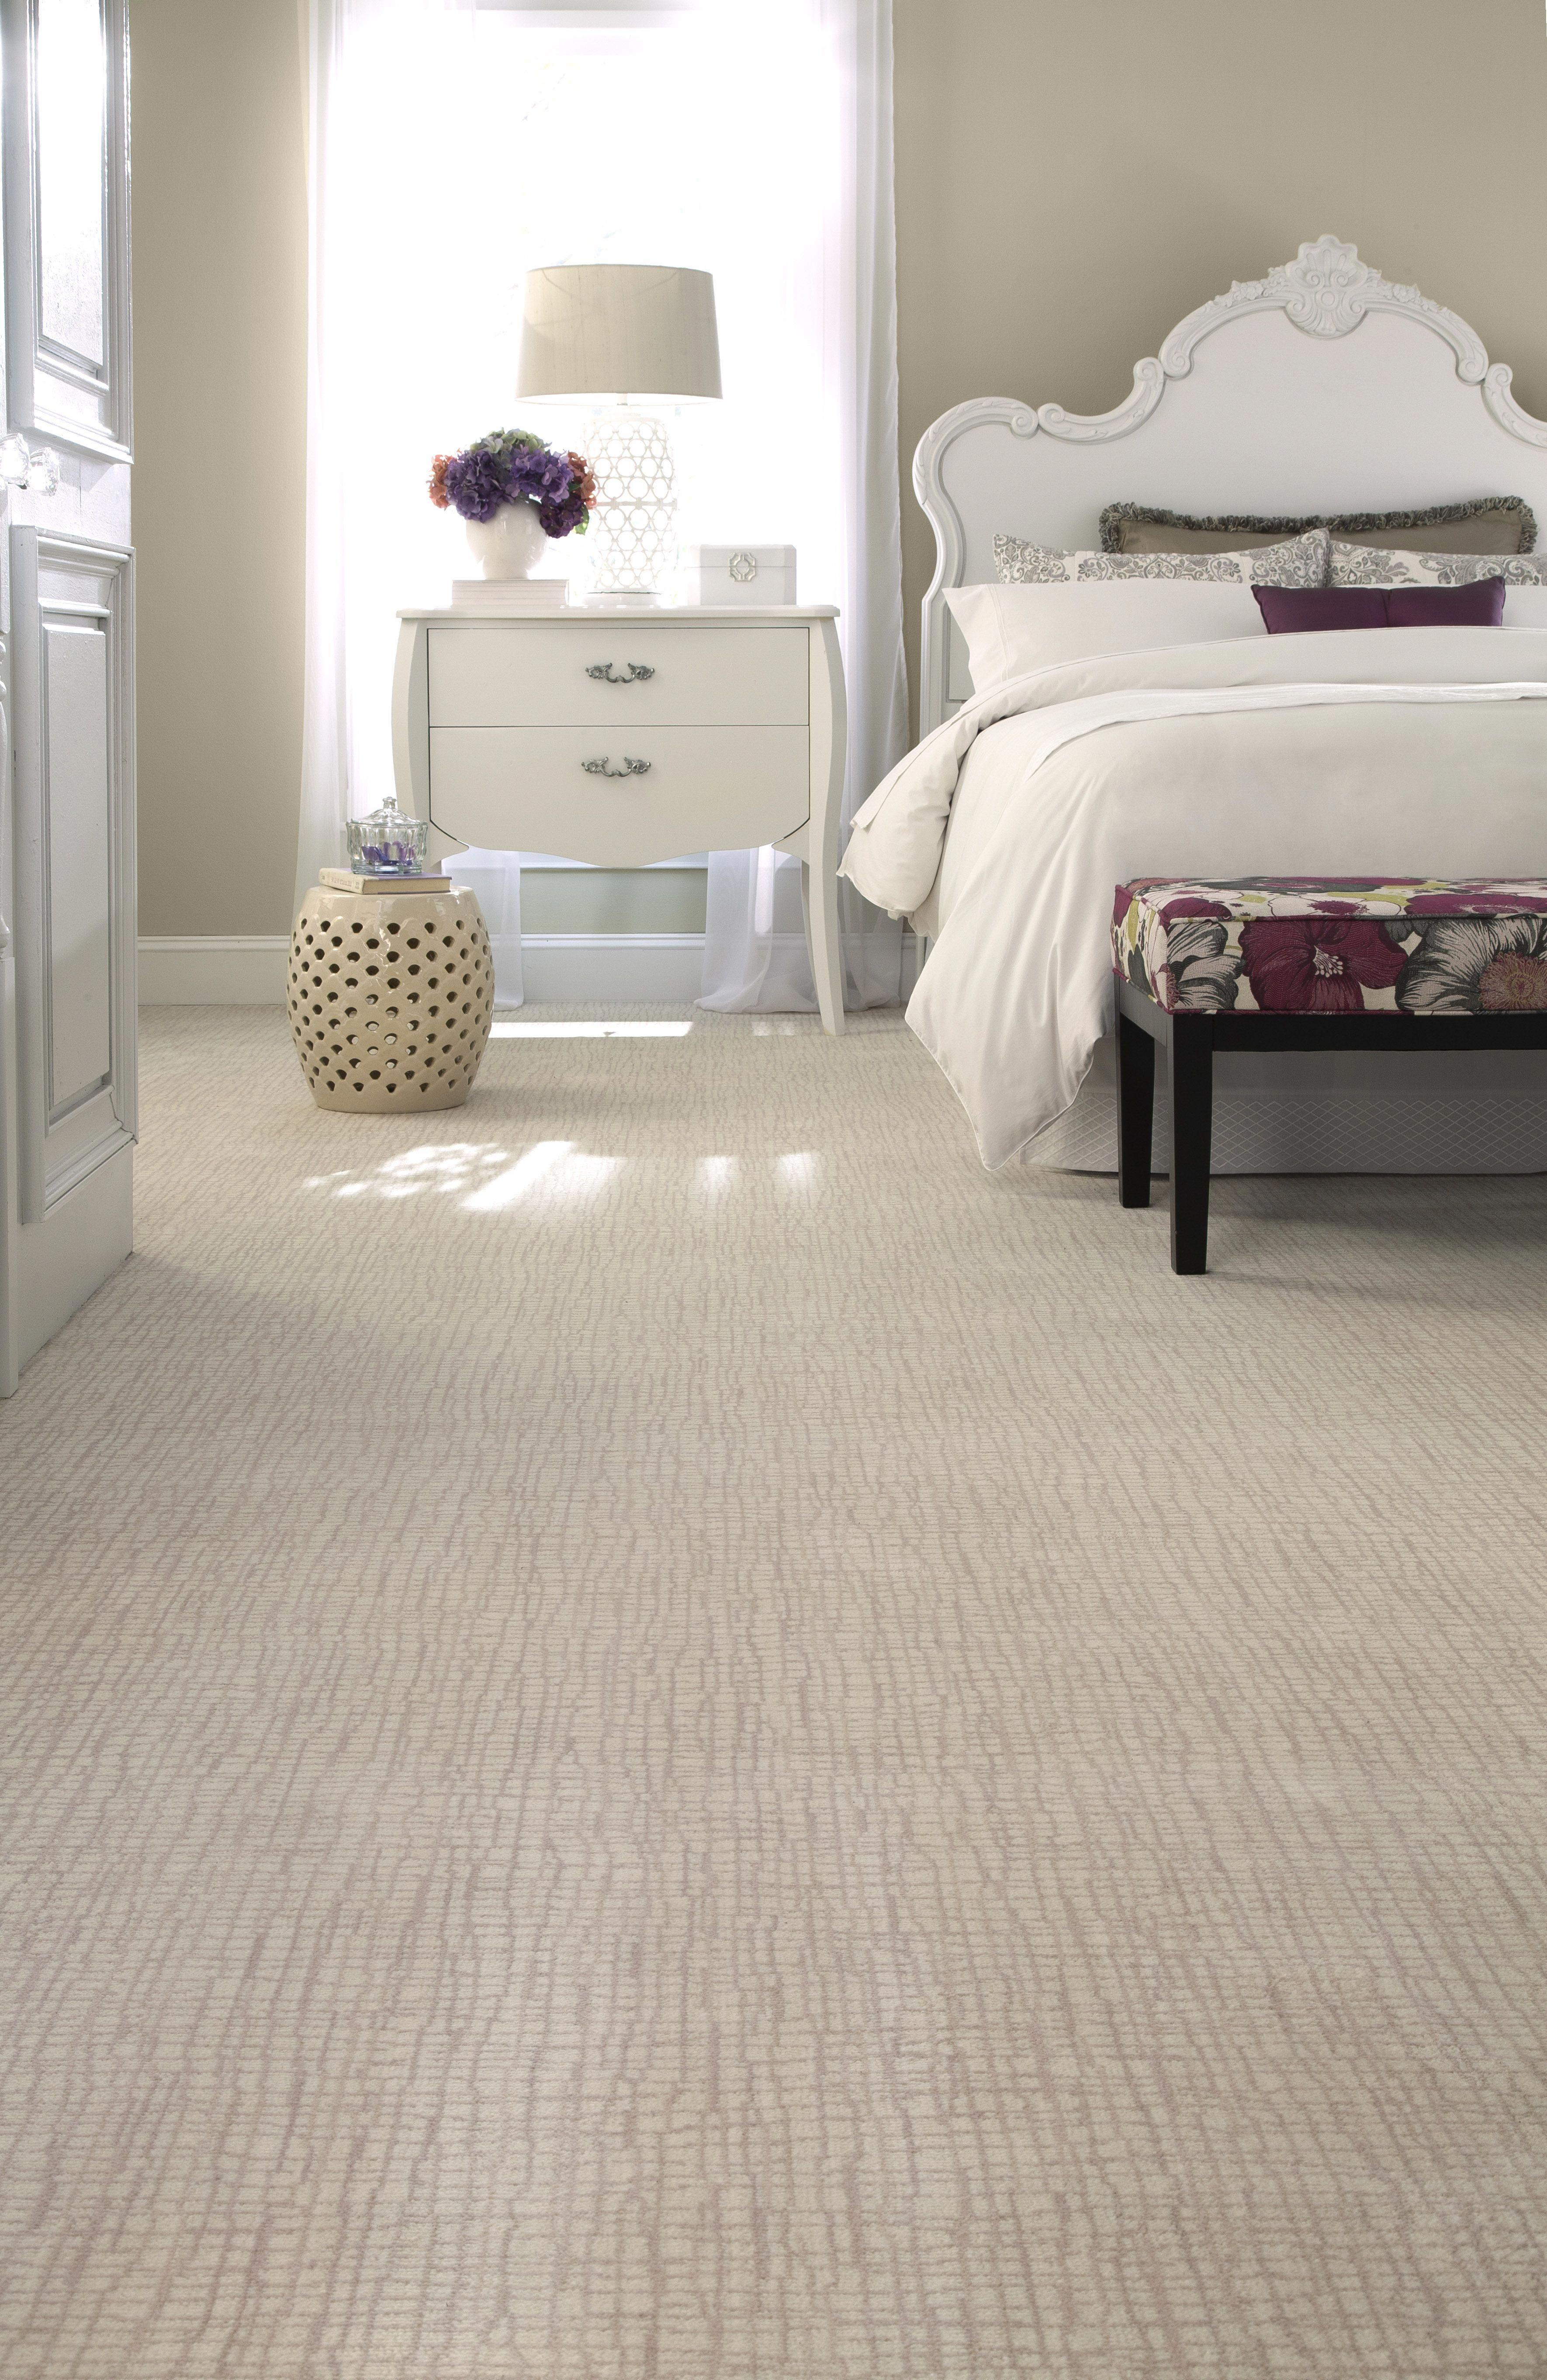 Best Buy Carpet Runner By The Foot Cheapcarpetrunnerssydney 640 x 480